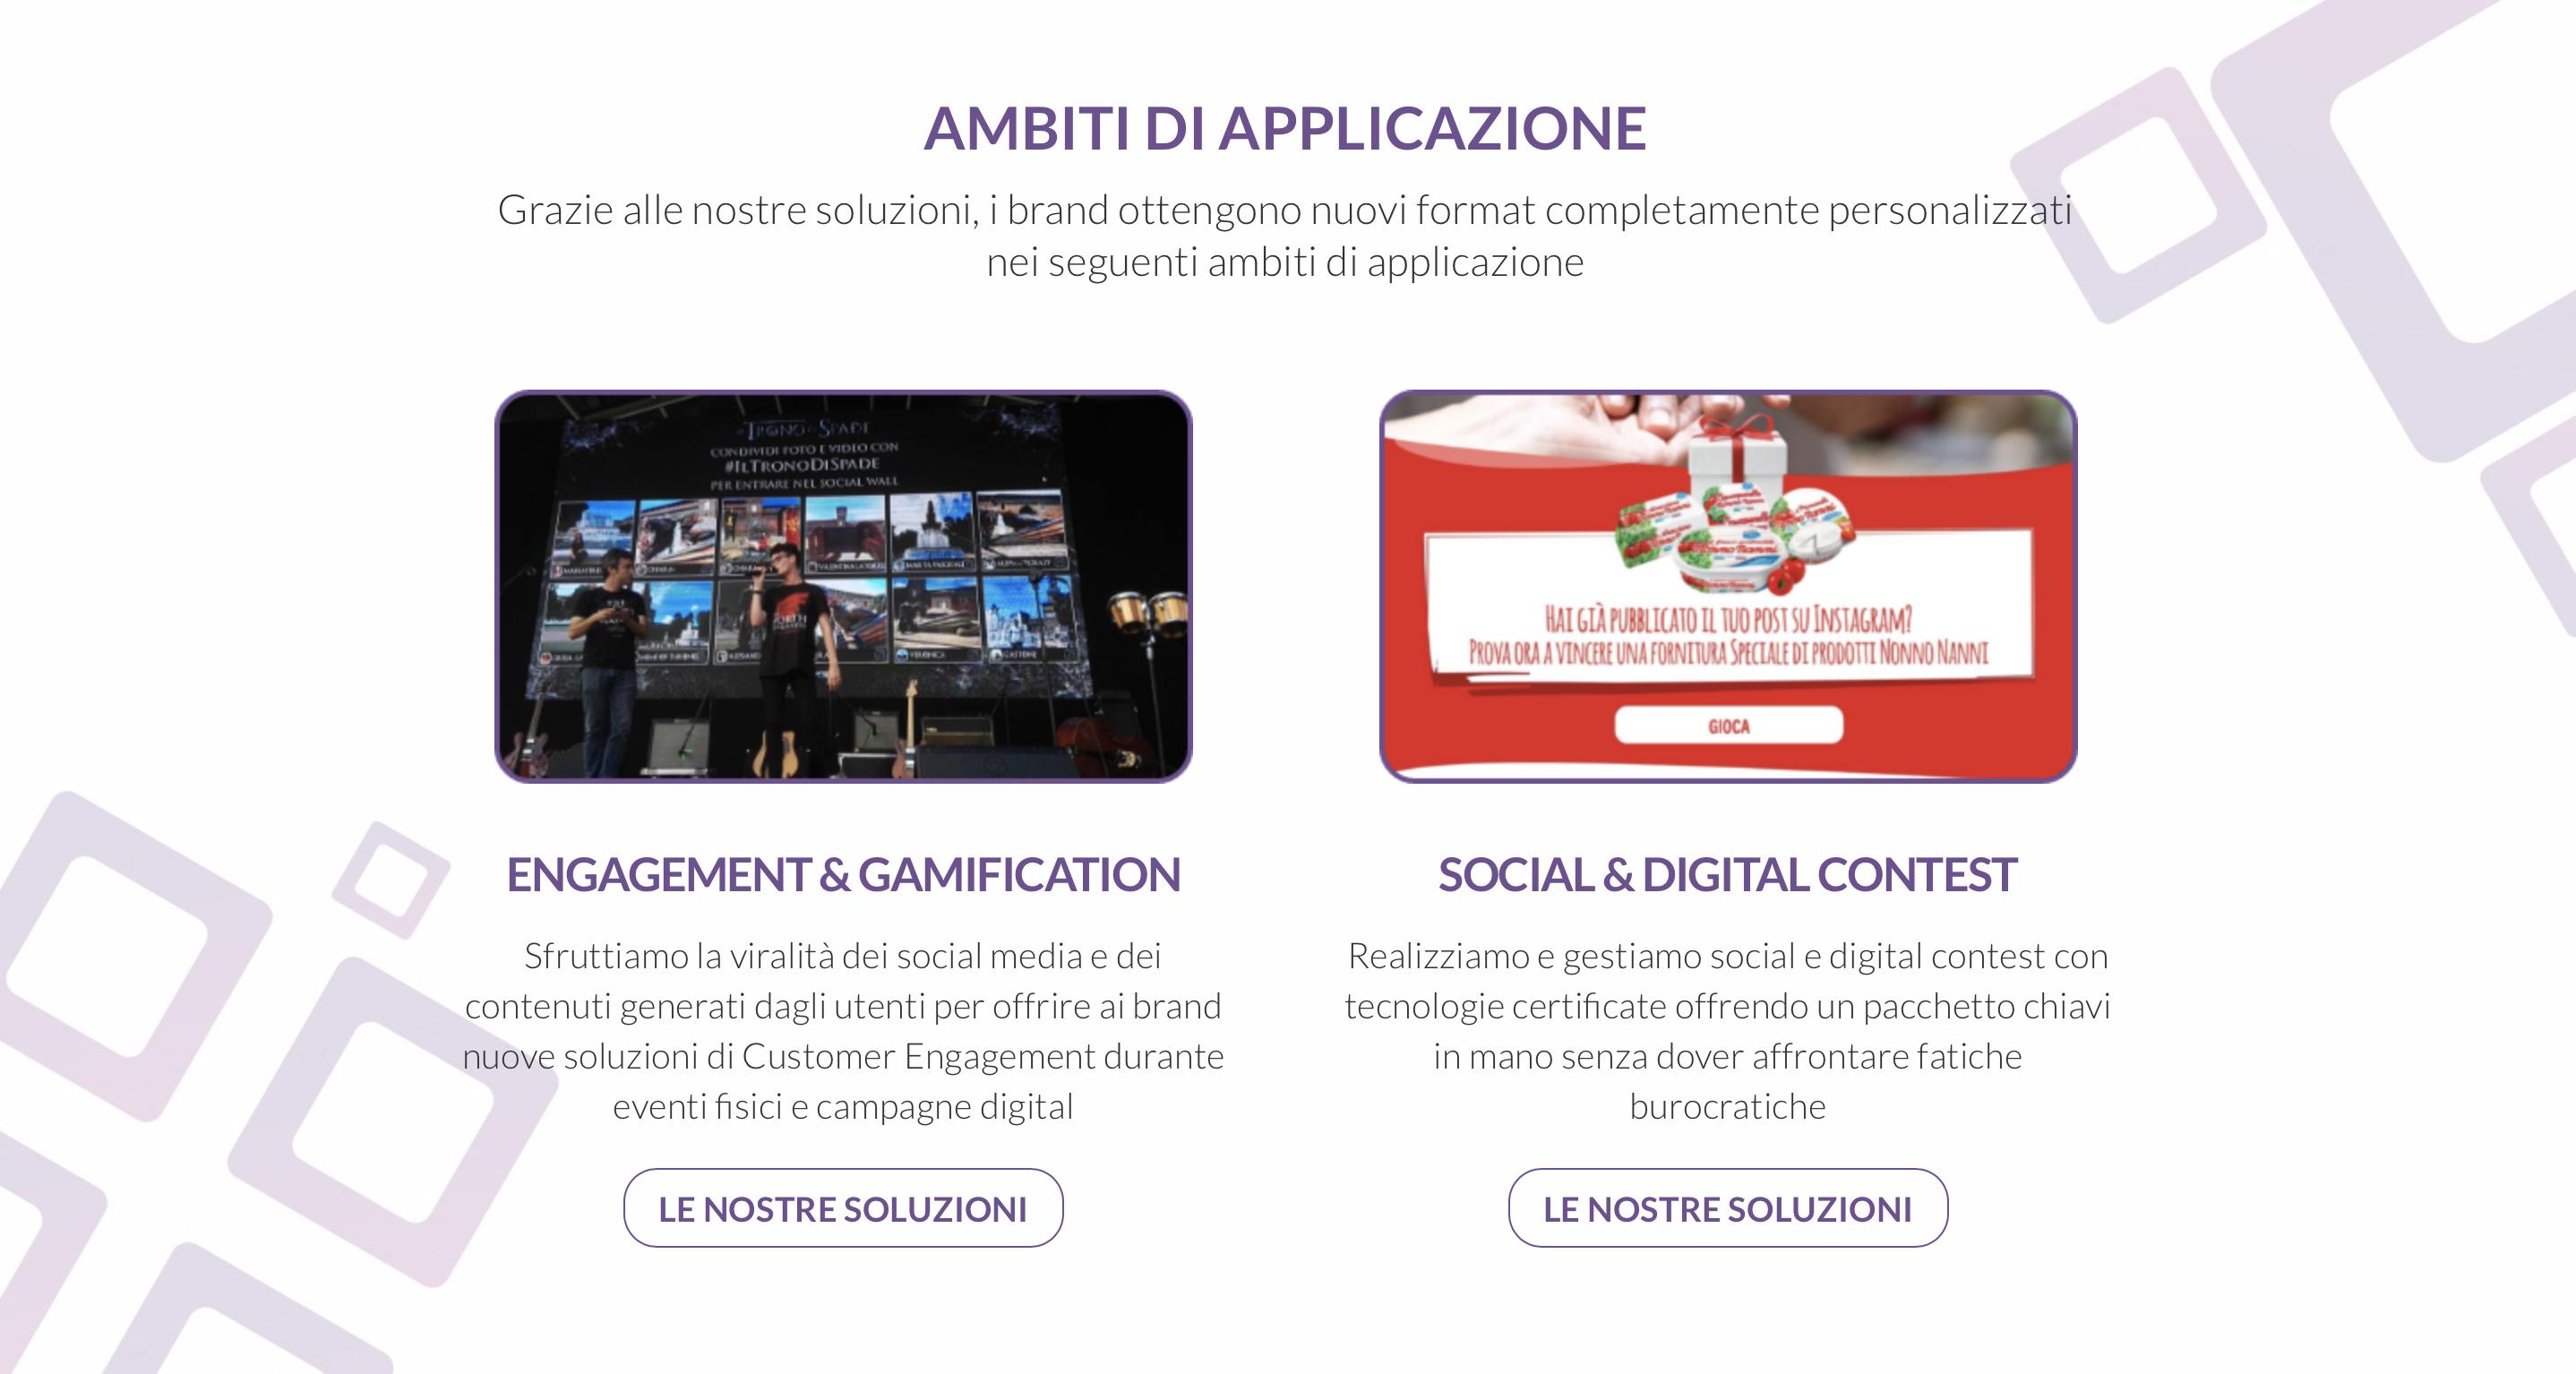 immagine Contest e engagement